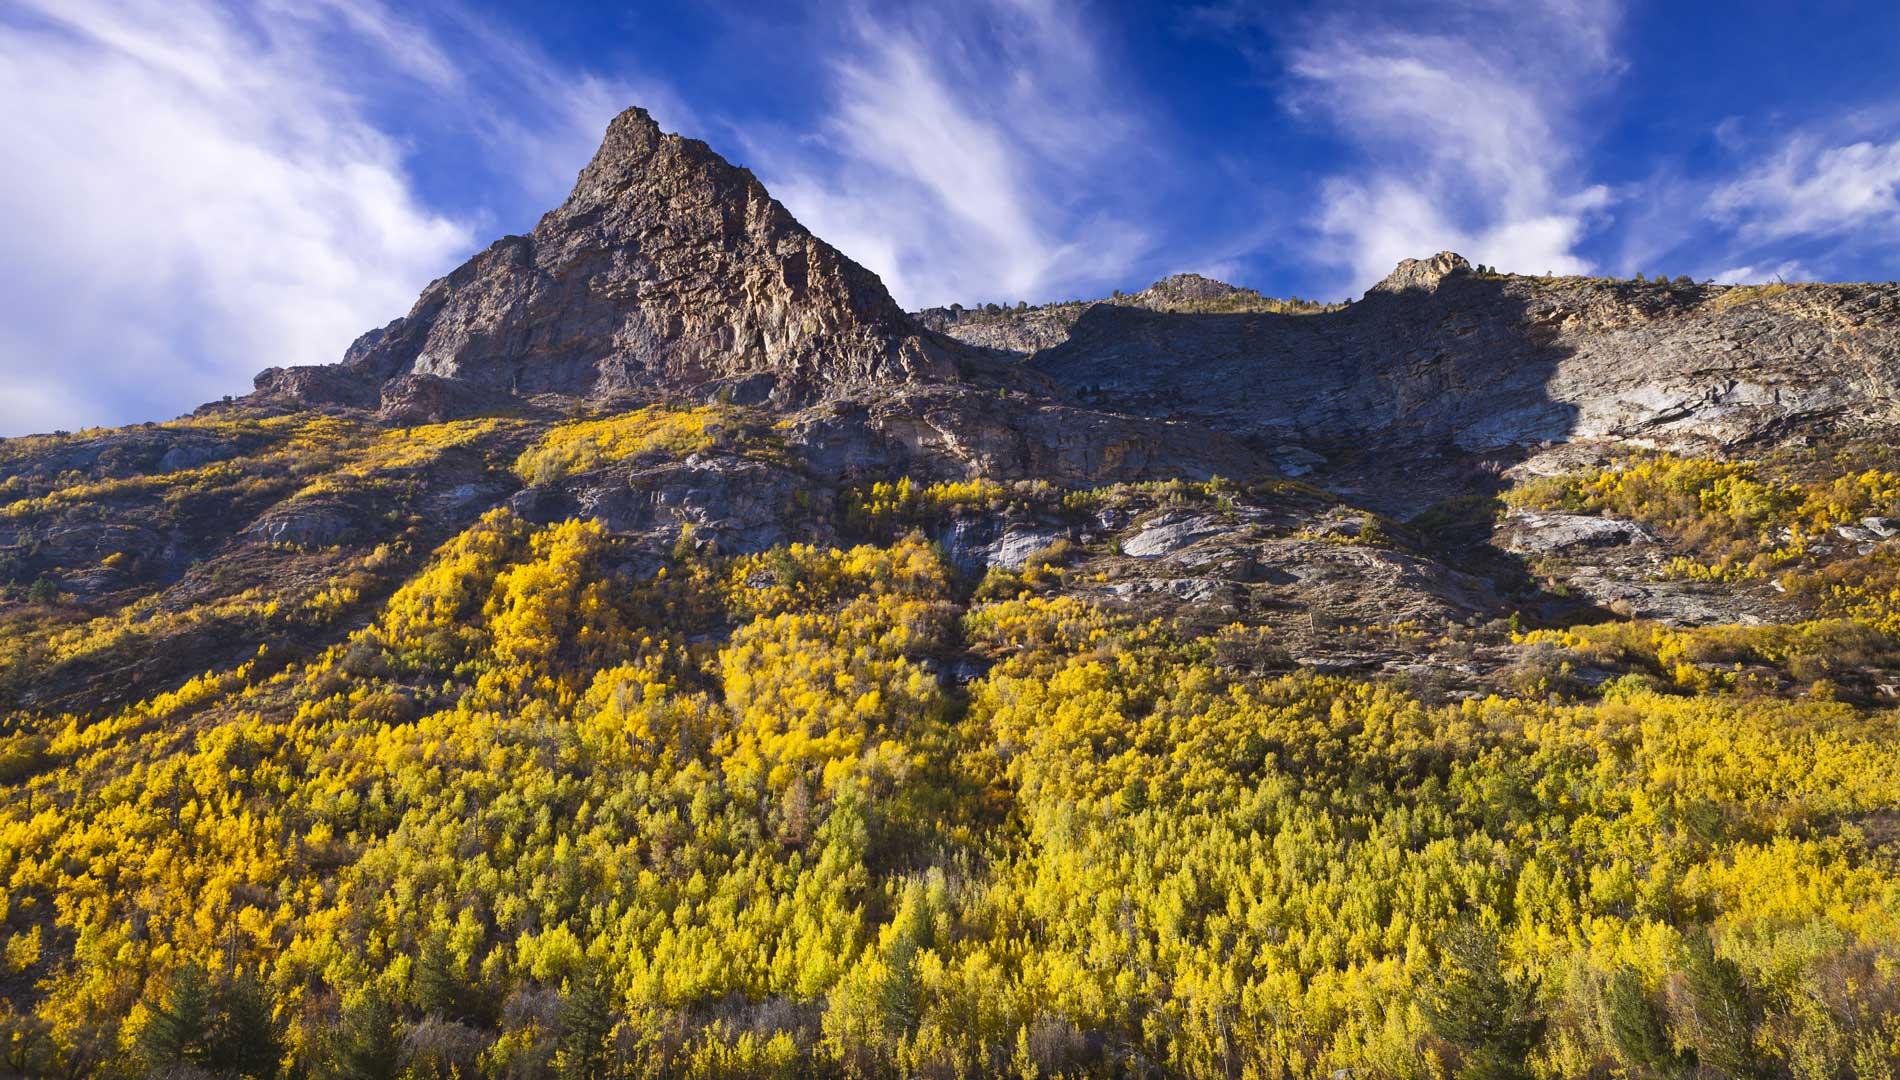 Mountain range in Elko, Nevada